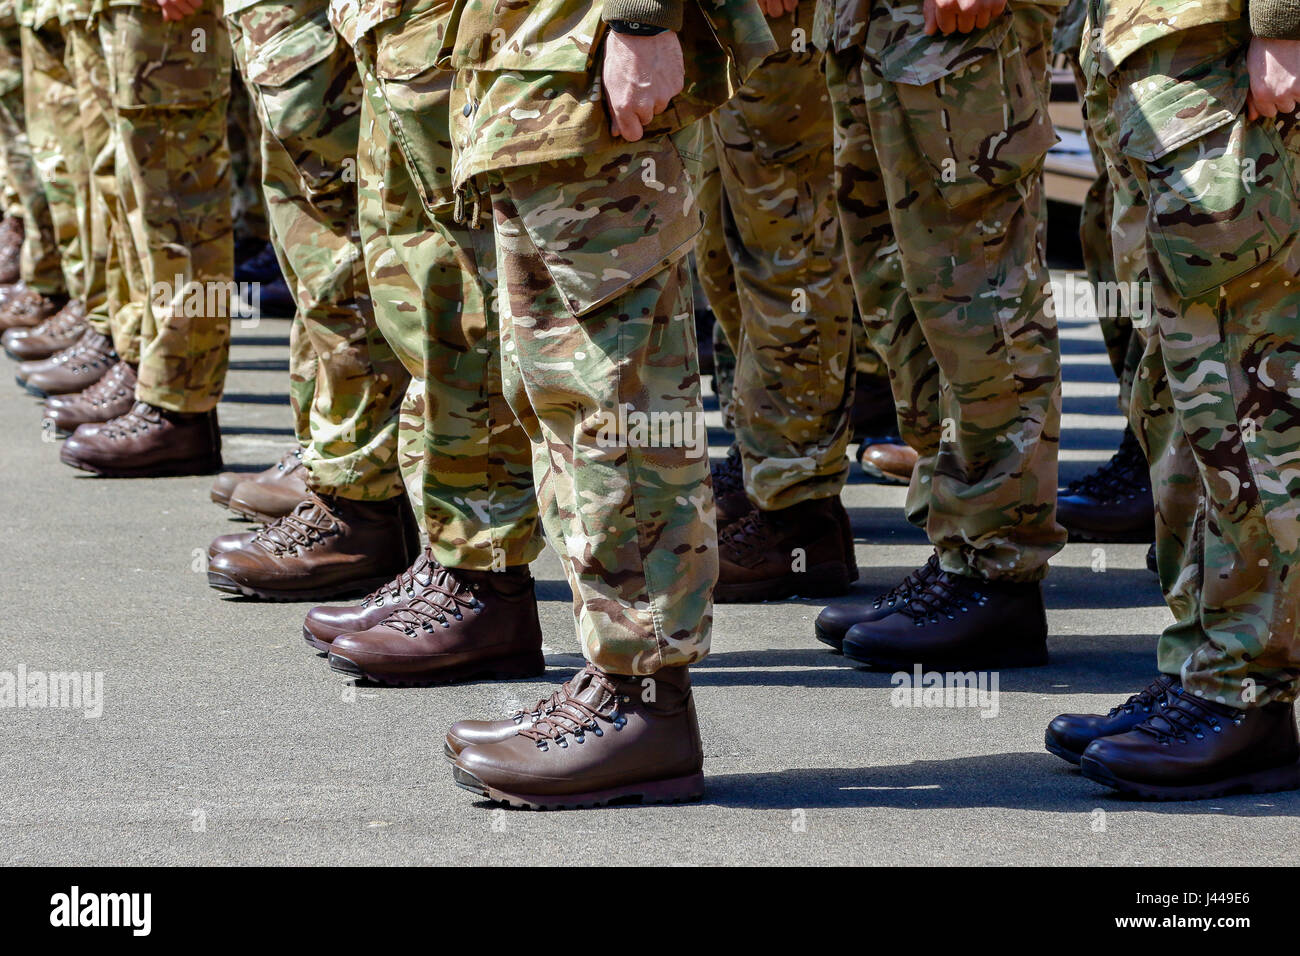 British soldiers on parade, Glasgow, Scotland, UK - Stock Image